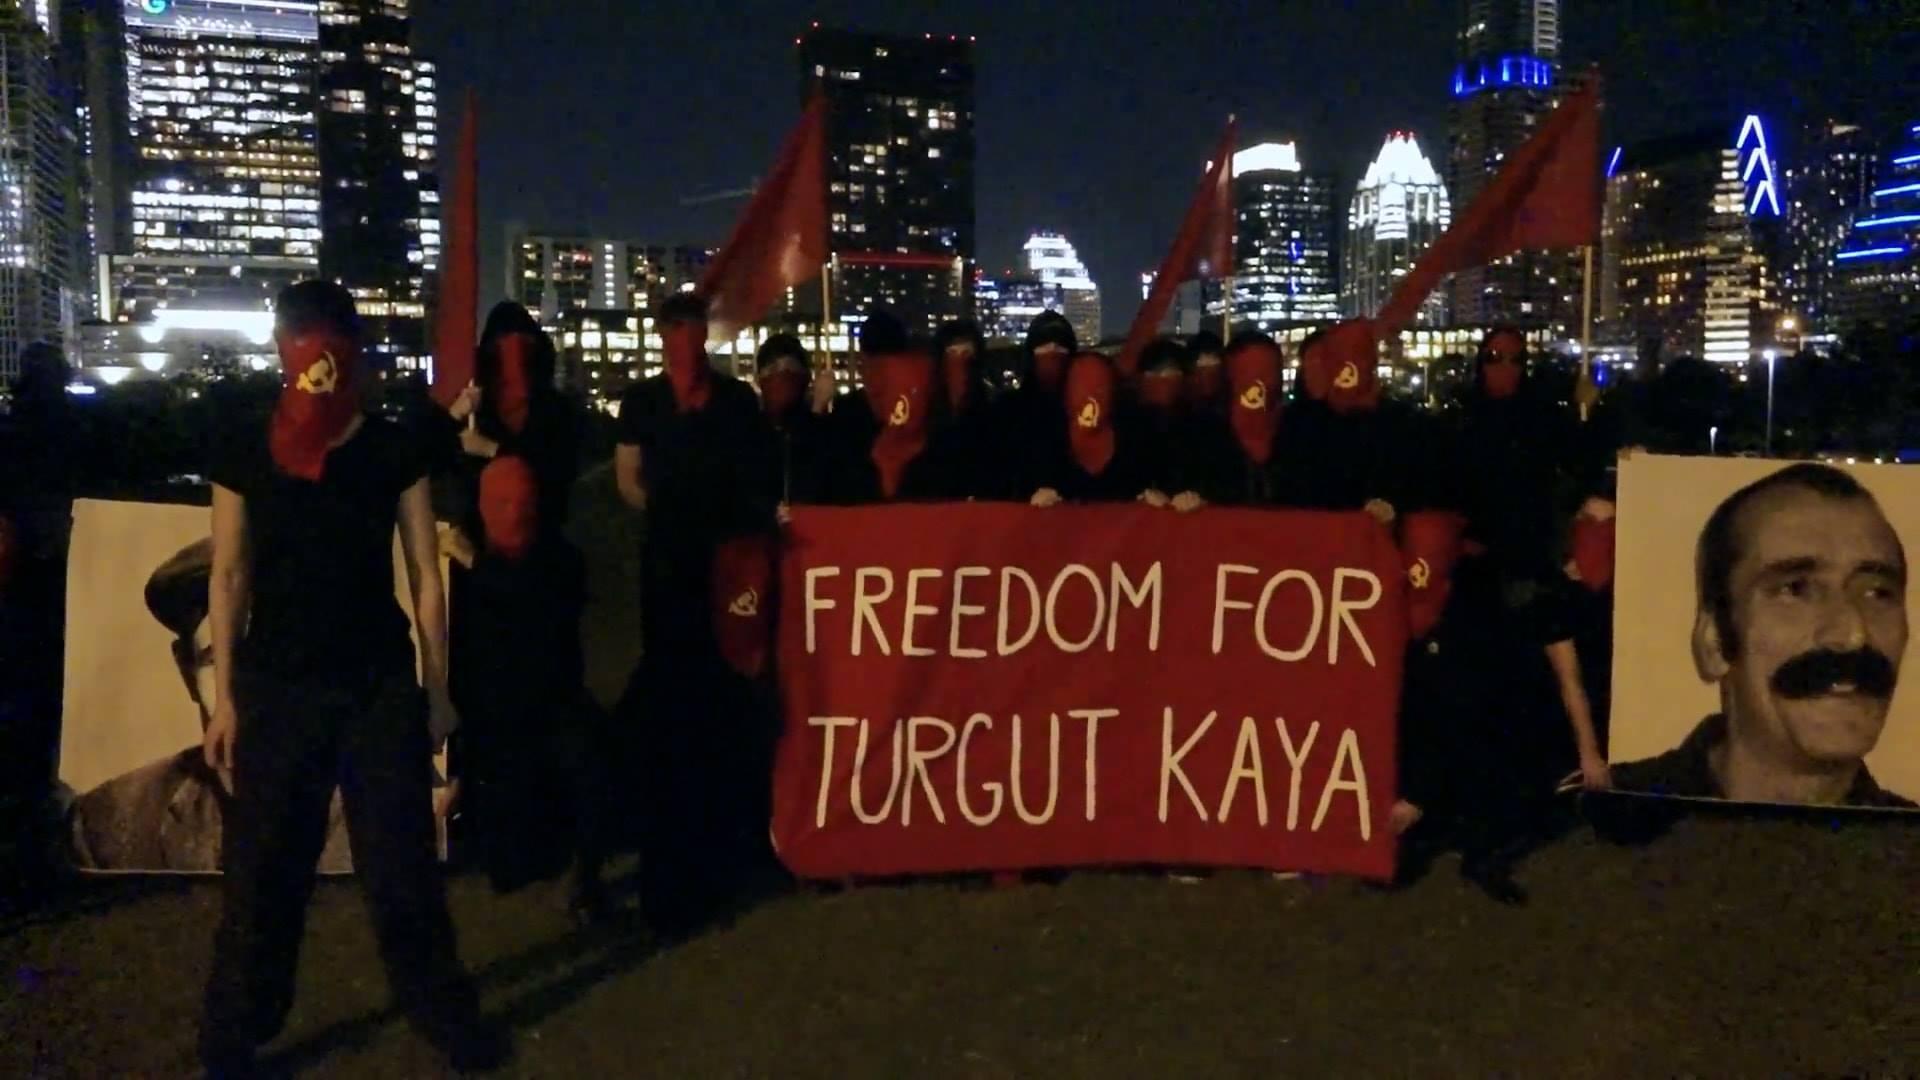 Solidarité avec Turgut Kaya depuis Austin (Texas).